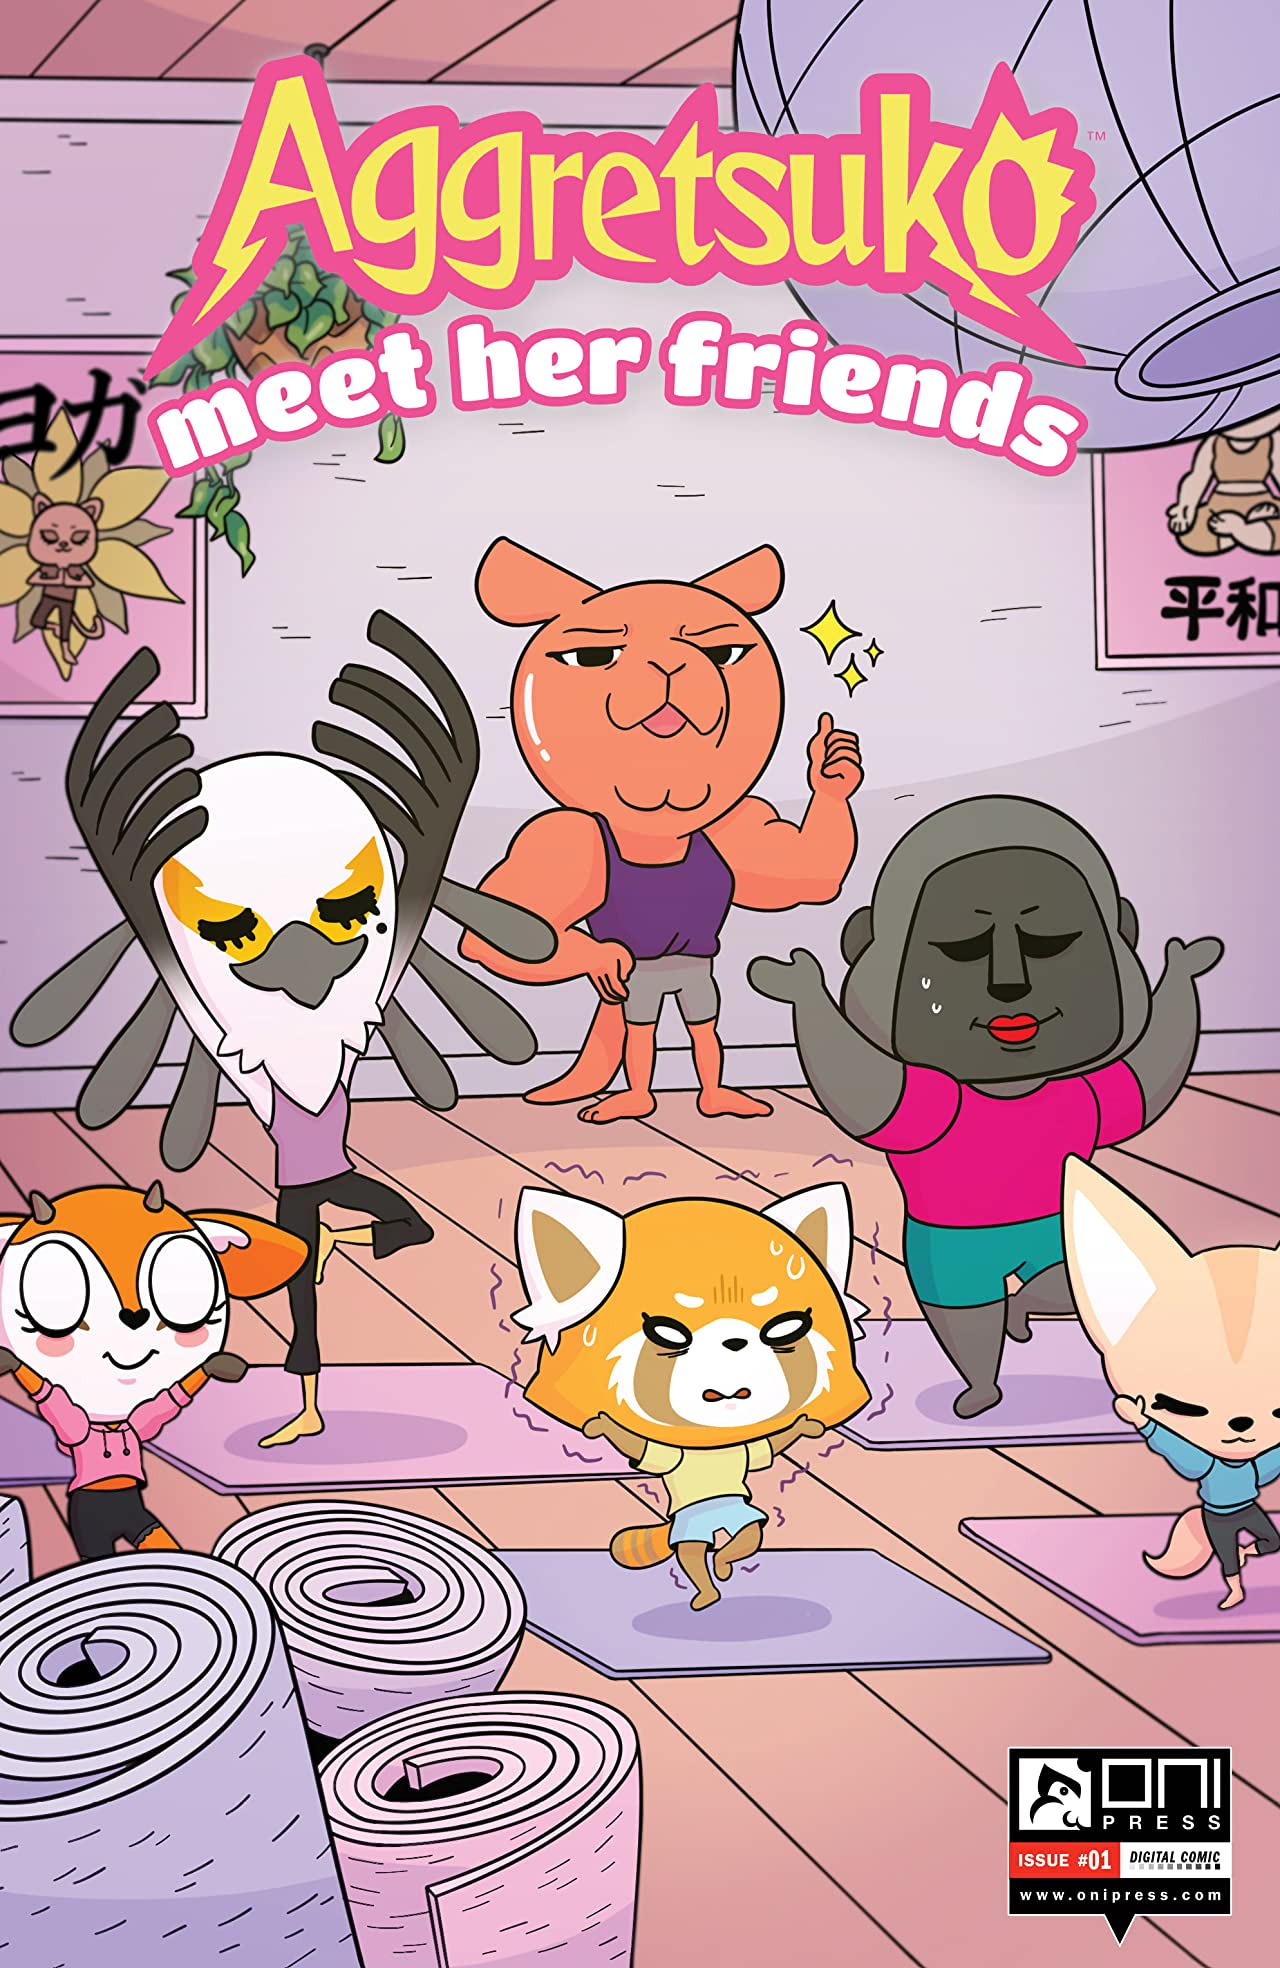 Aggretsuko Meet Her Friends No.1